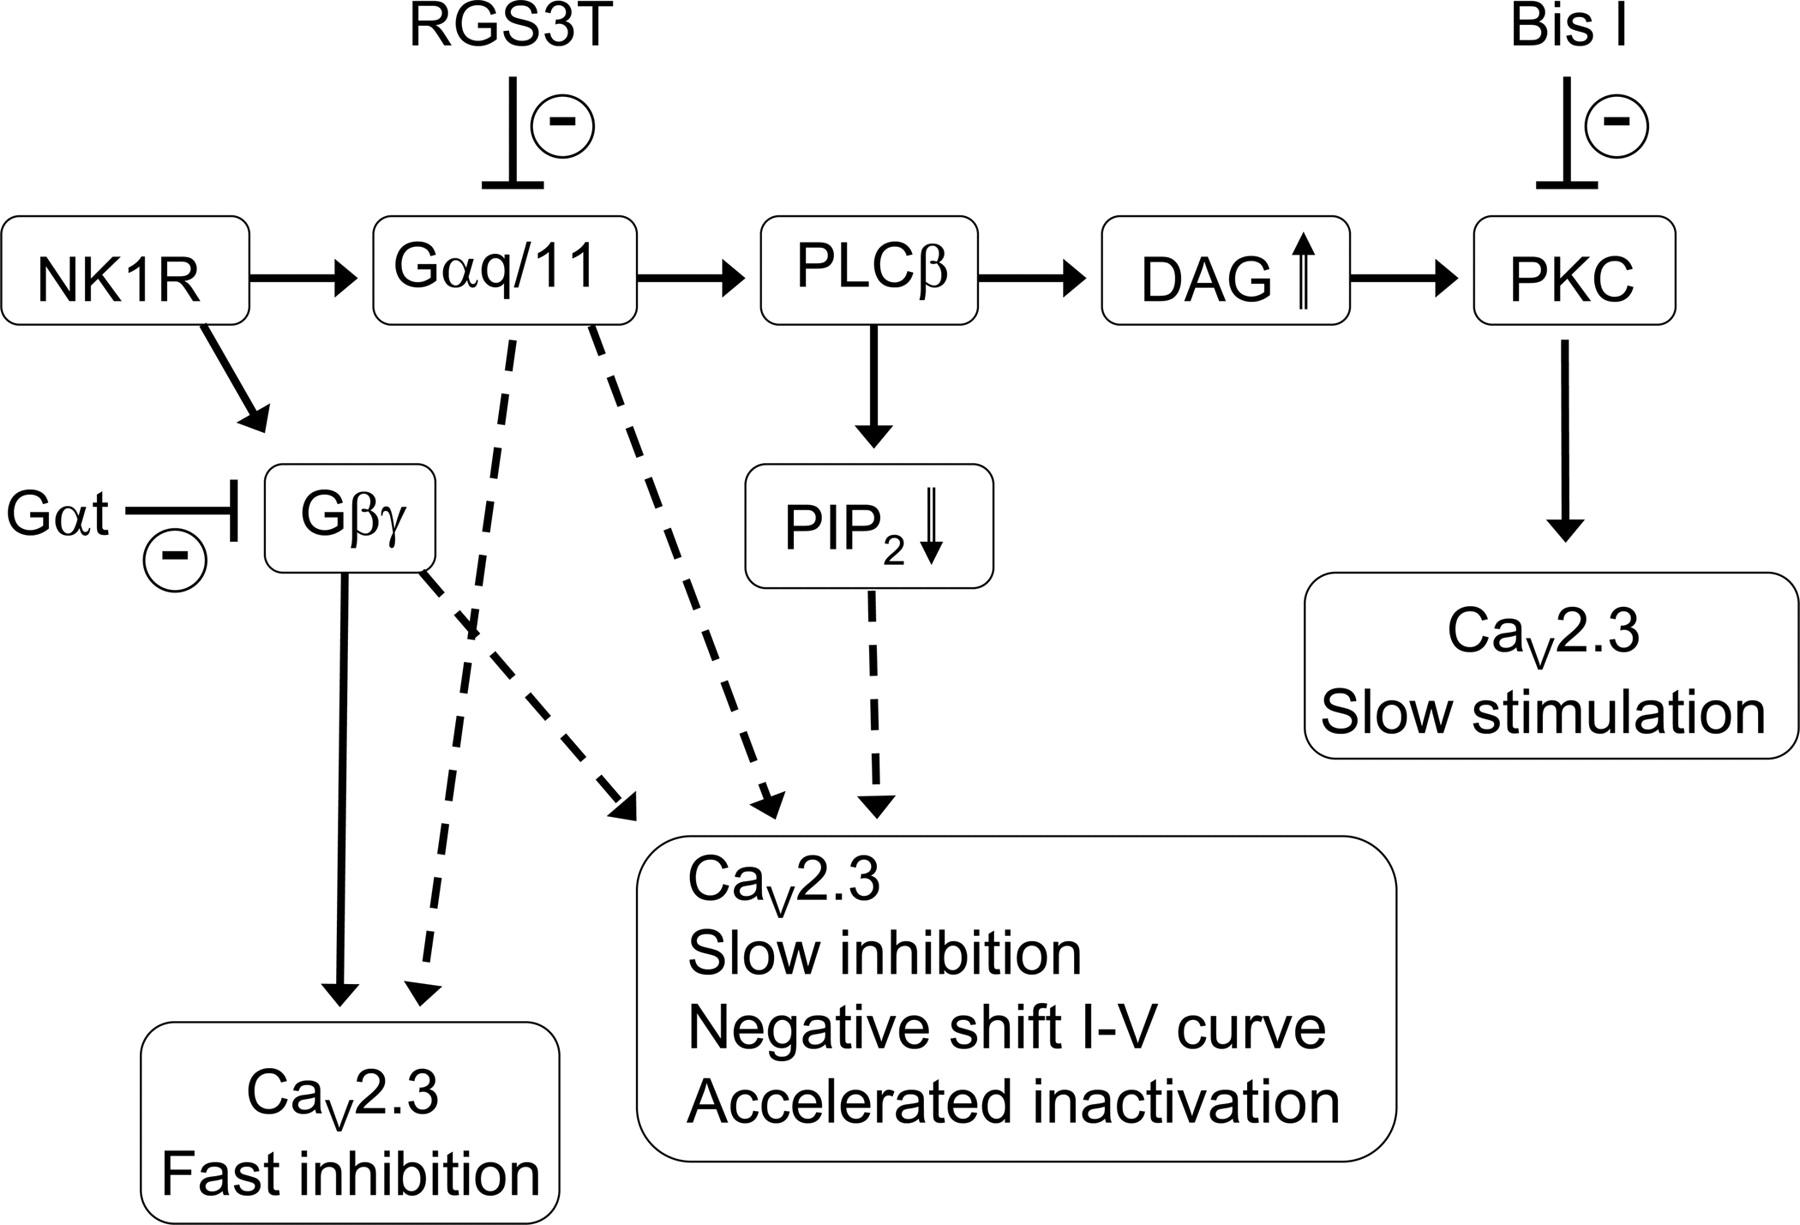 Neurokinin 1 Receptors Trigger Overlapping Stimulation And Pentium 3 Block Diagram Download Figure